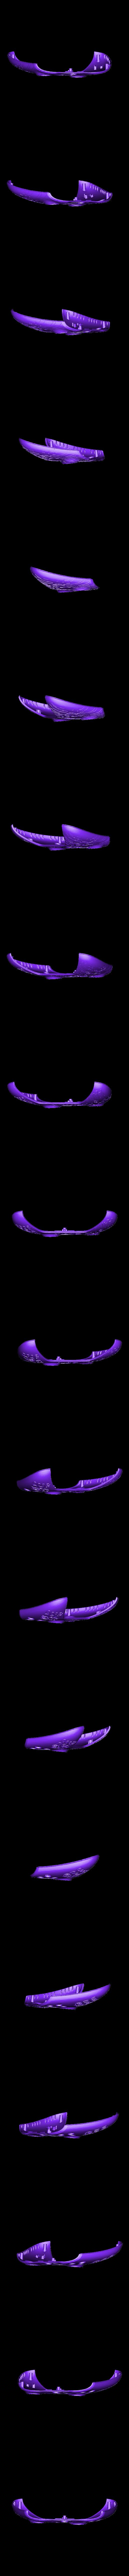 endgame_controller_v2.stl Download free STL file Xbox One S Custom Controller Shell: Avengers Endgame Edition • 3D print object, mmjames